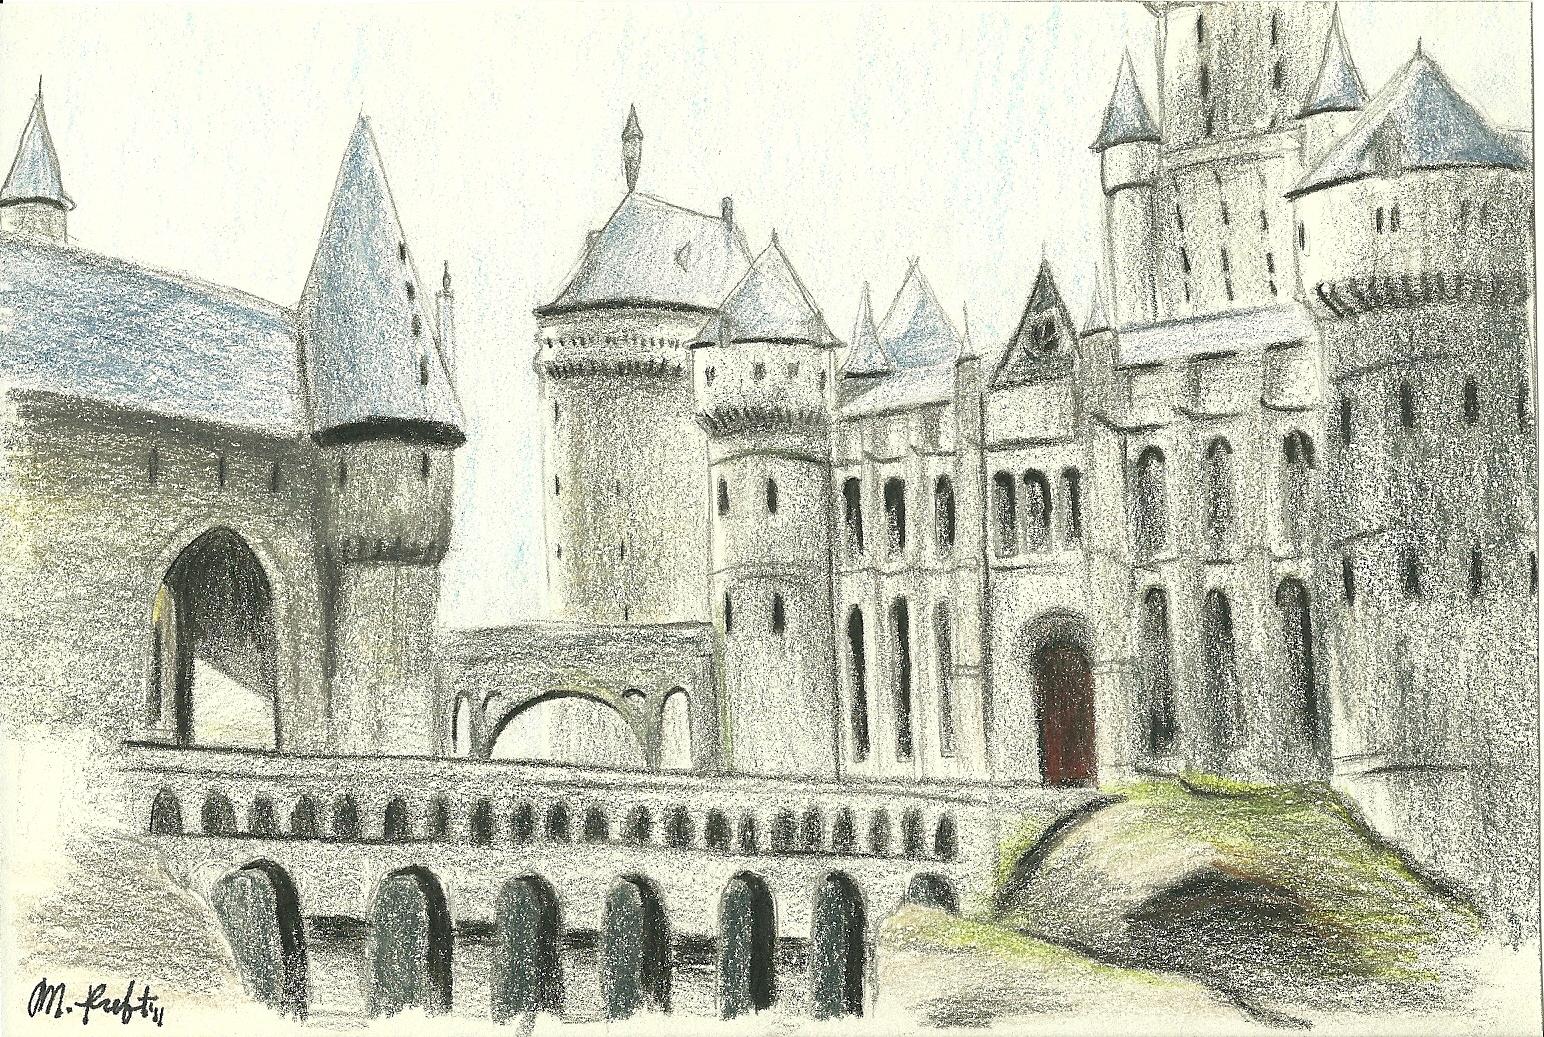 1544x1037 Hogwarts Castle By Shelbygt 500kr